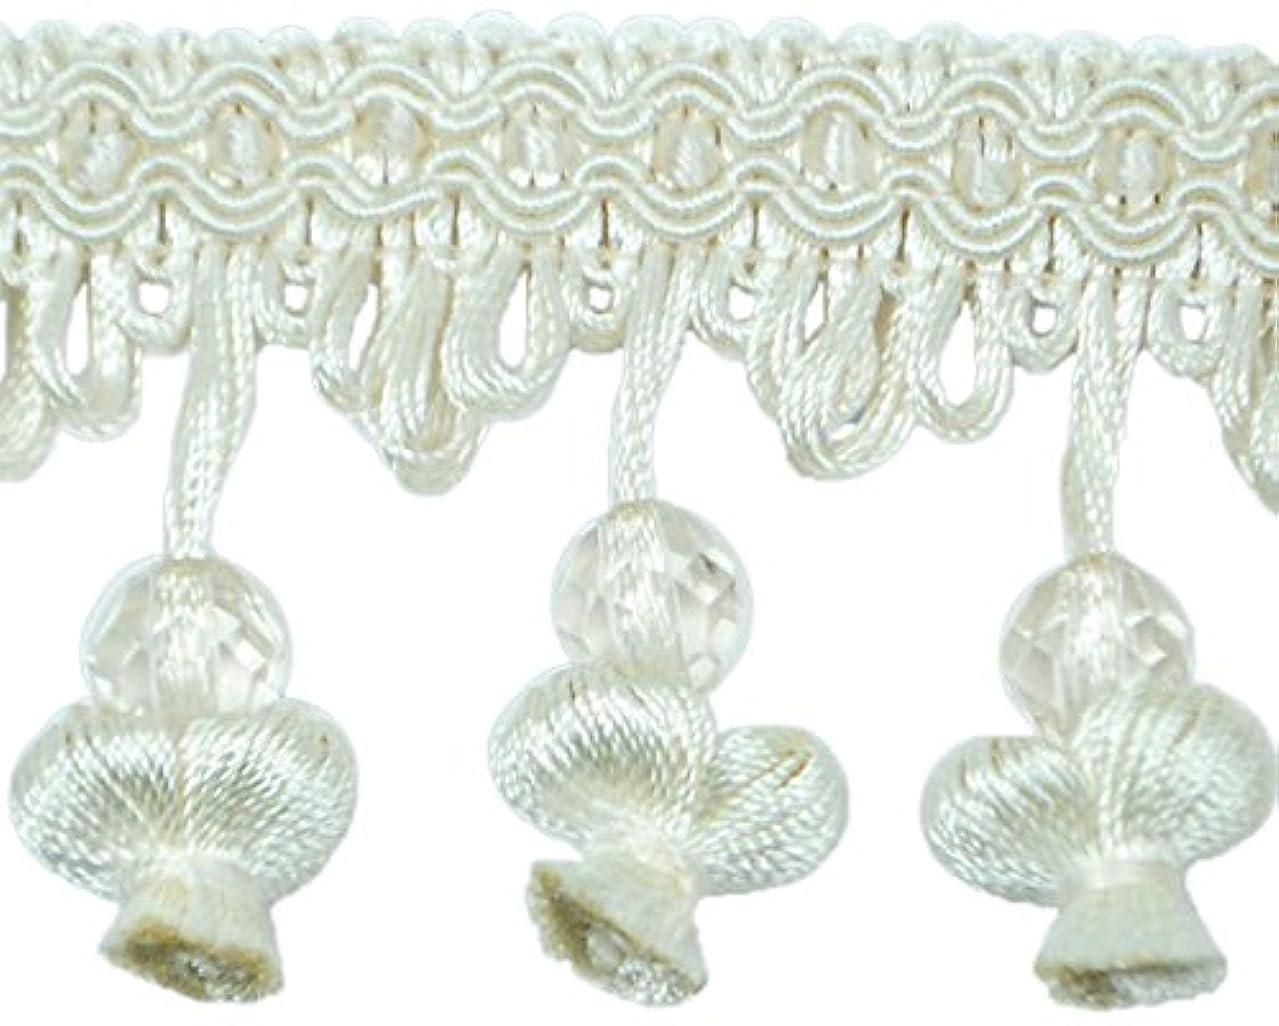 Expo International Stacia Onion Tassel Bead Fringe Trim Embellishment, 20-Yard, Ivory